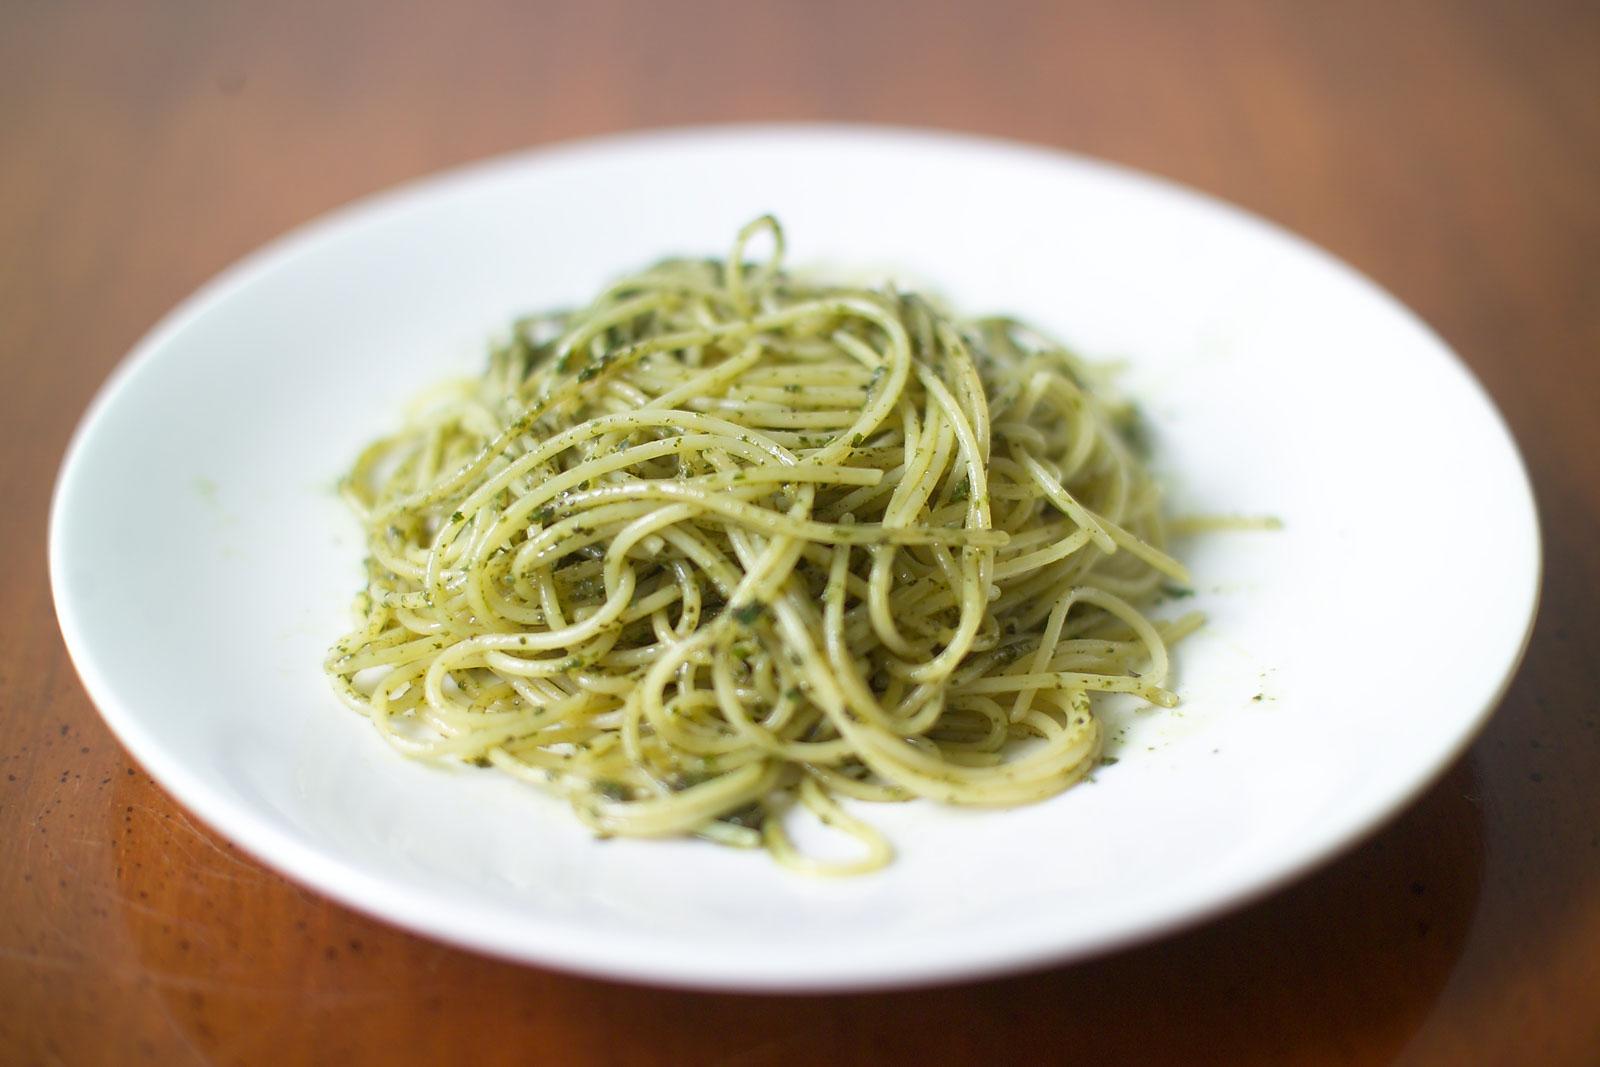 Spaghetti with basil pesto - what I eat